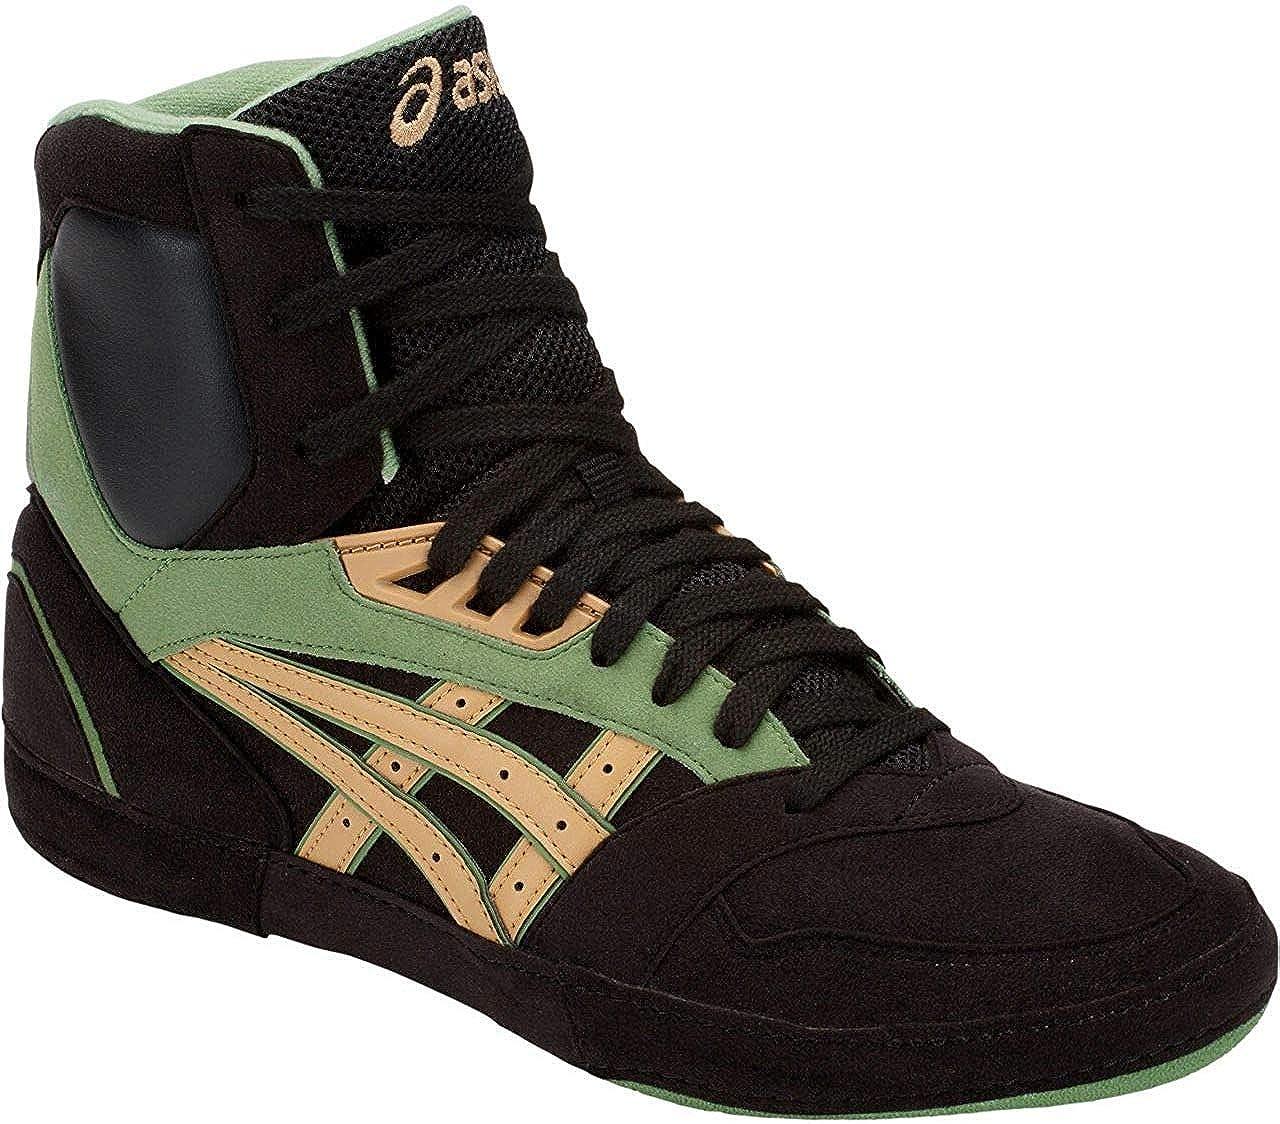 asics wrestling shoes discount list